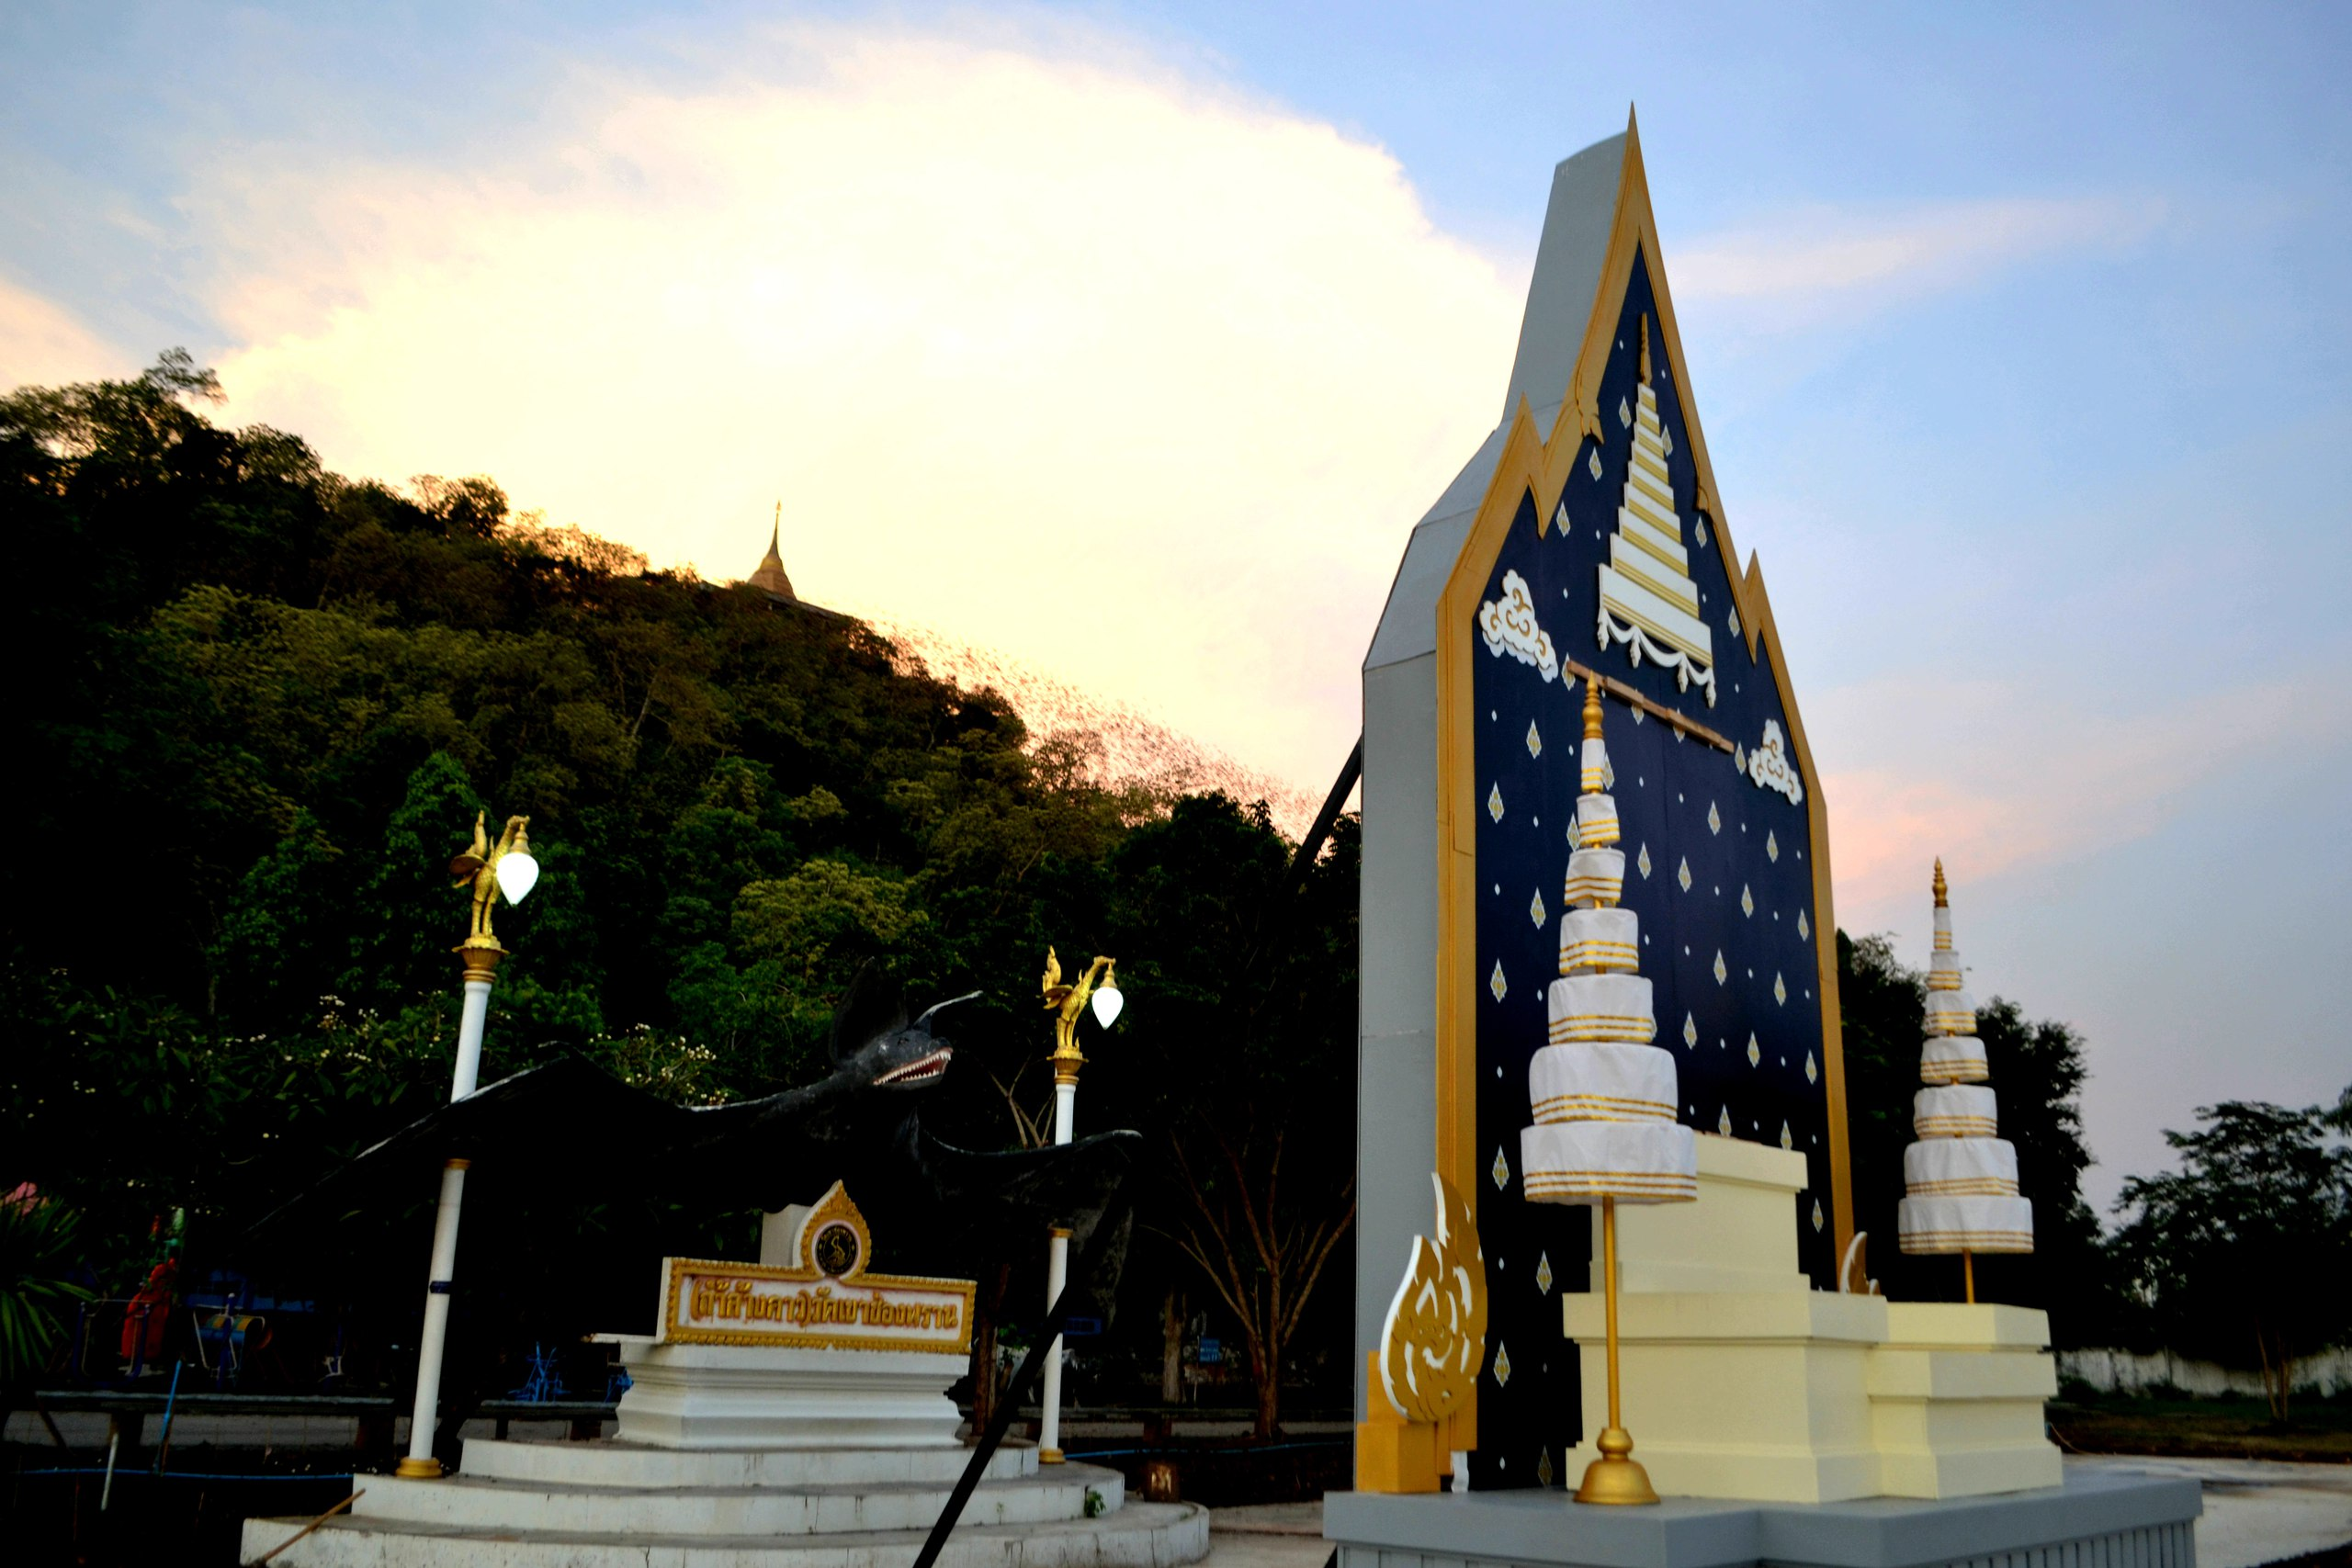 Елена Руденко (Валтея). Таиланд. Таиланд. Paтчaбуpи: Пещера страха, Пещера мышей, Буддийский храм H8HJJtW3ZqQ